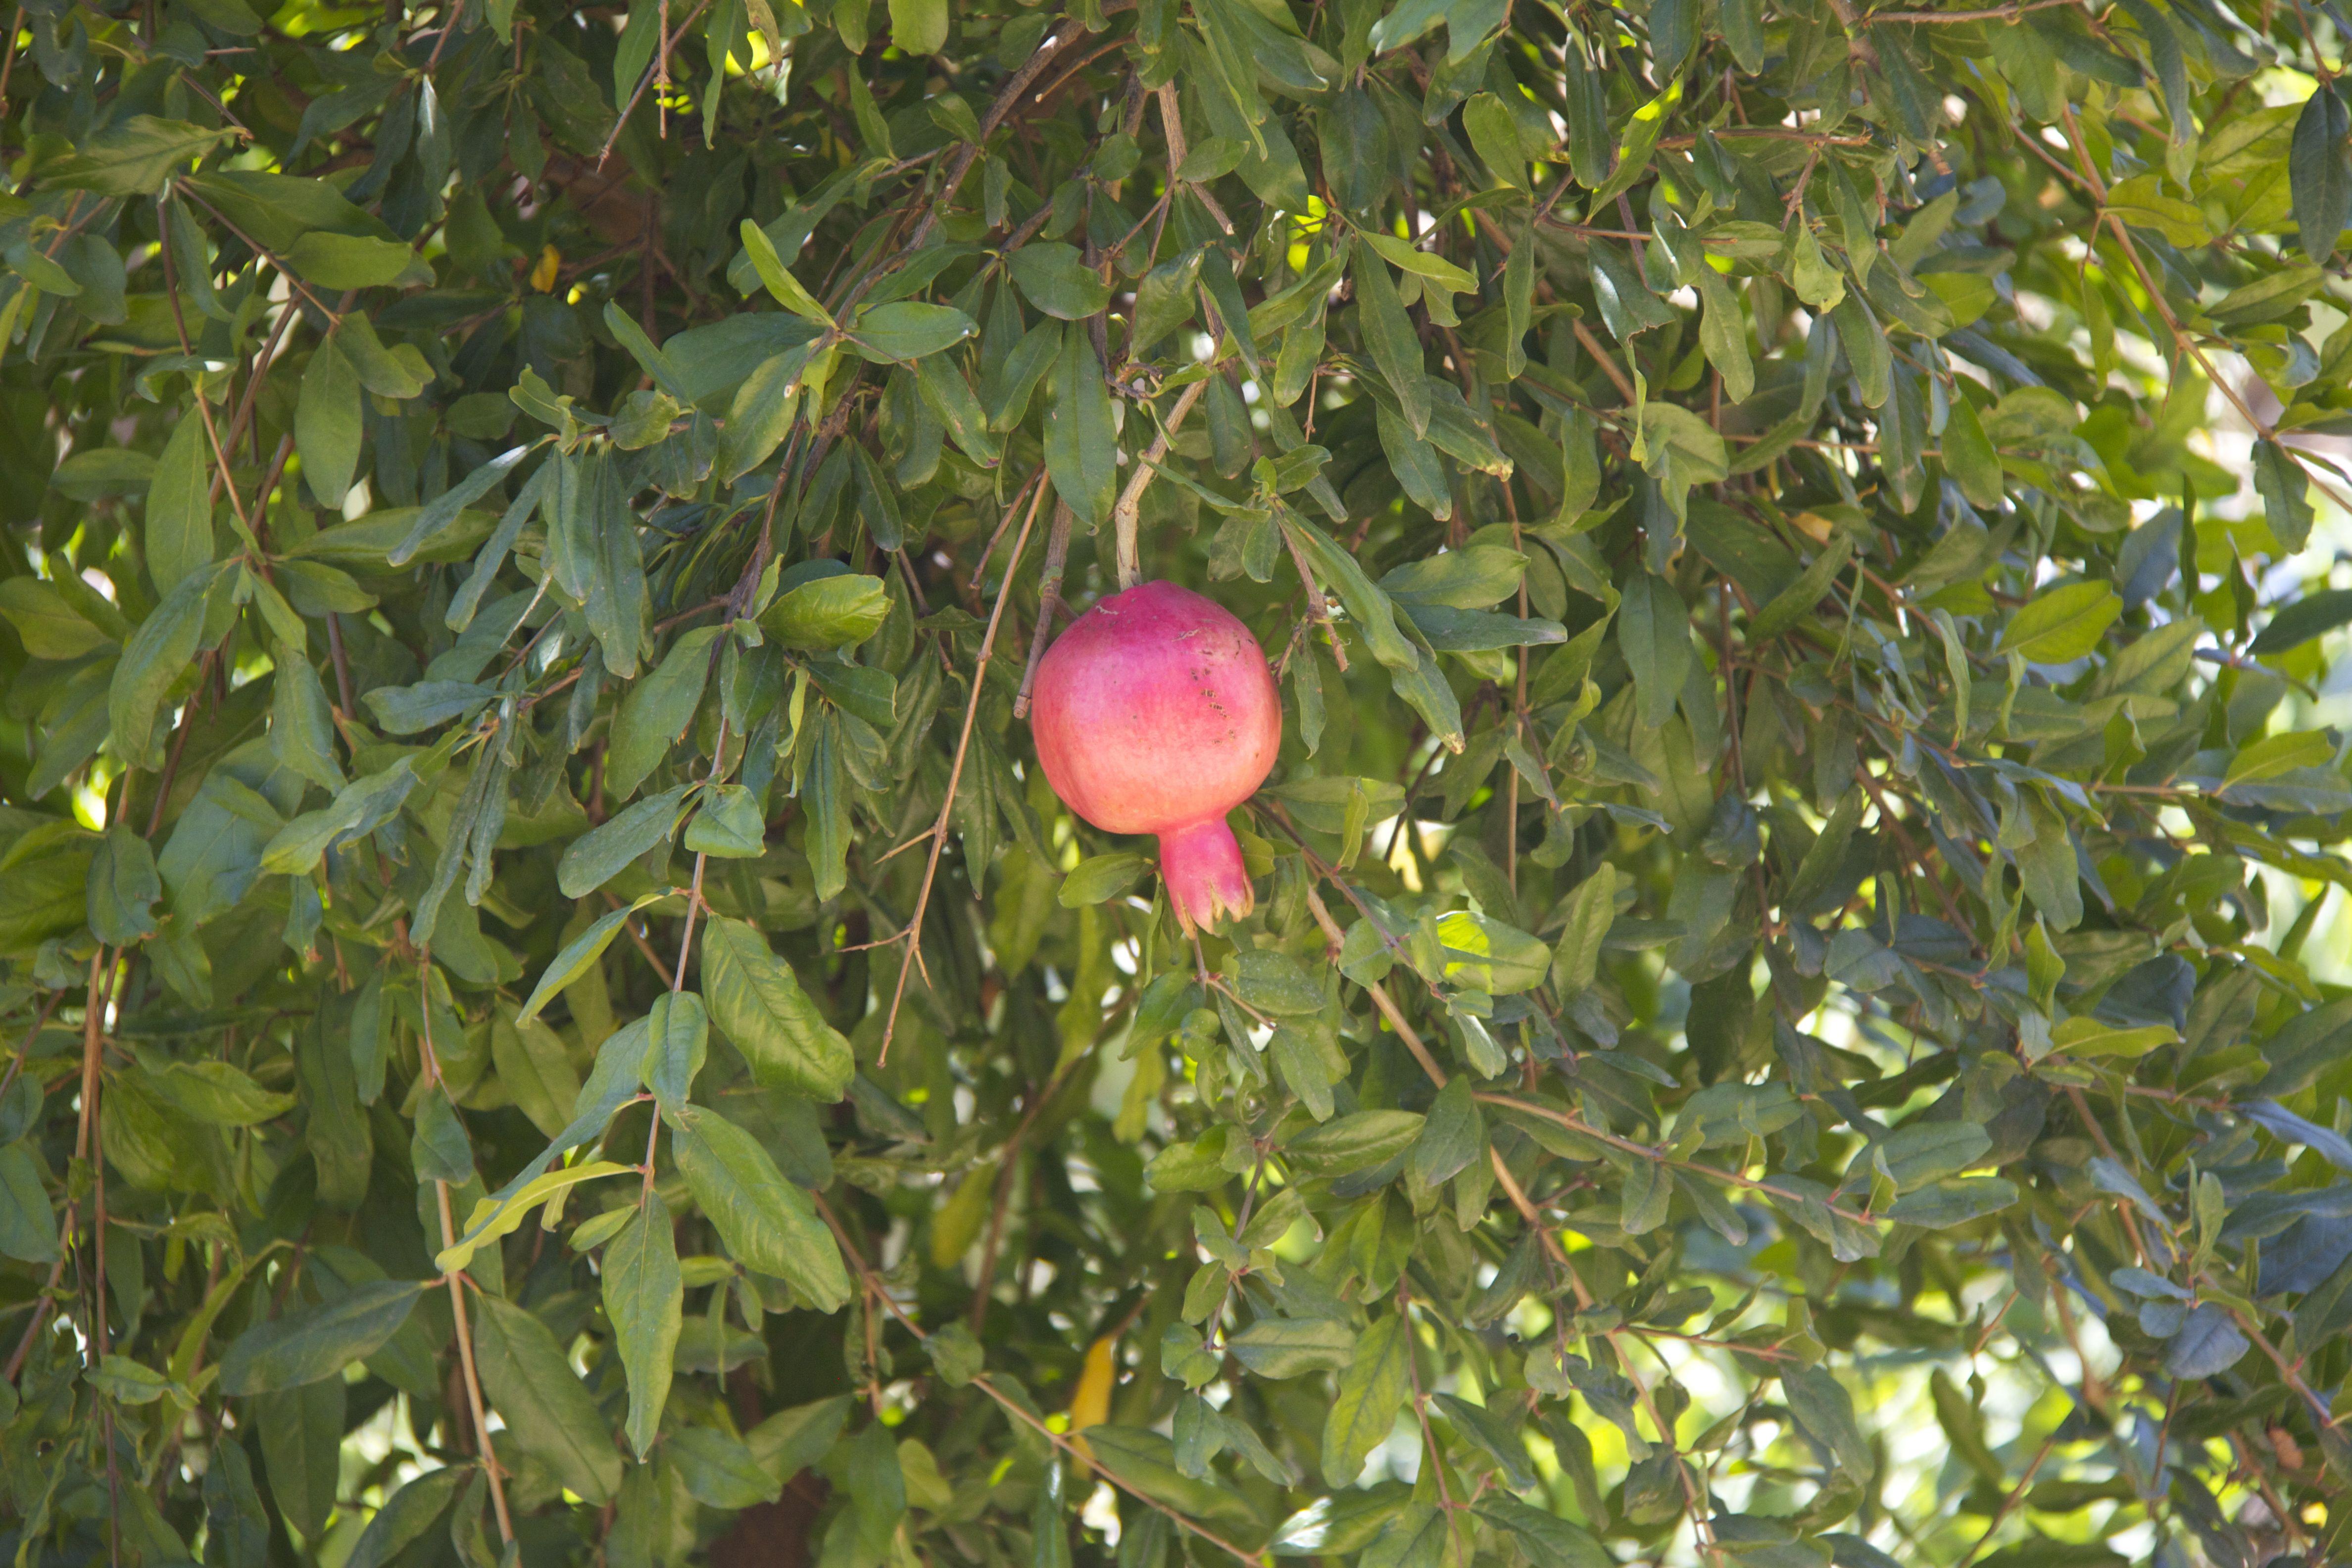 Pomegranate, Babylonstoren, South Africa